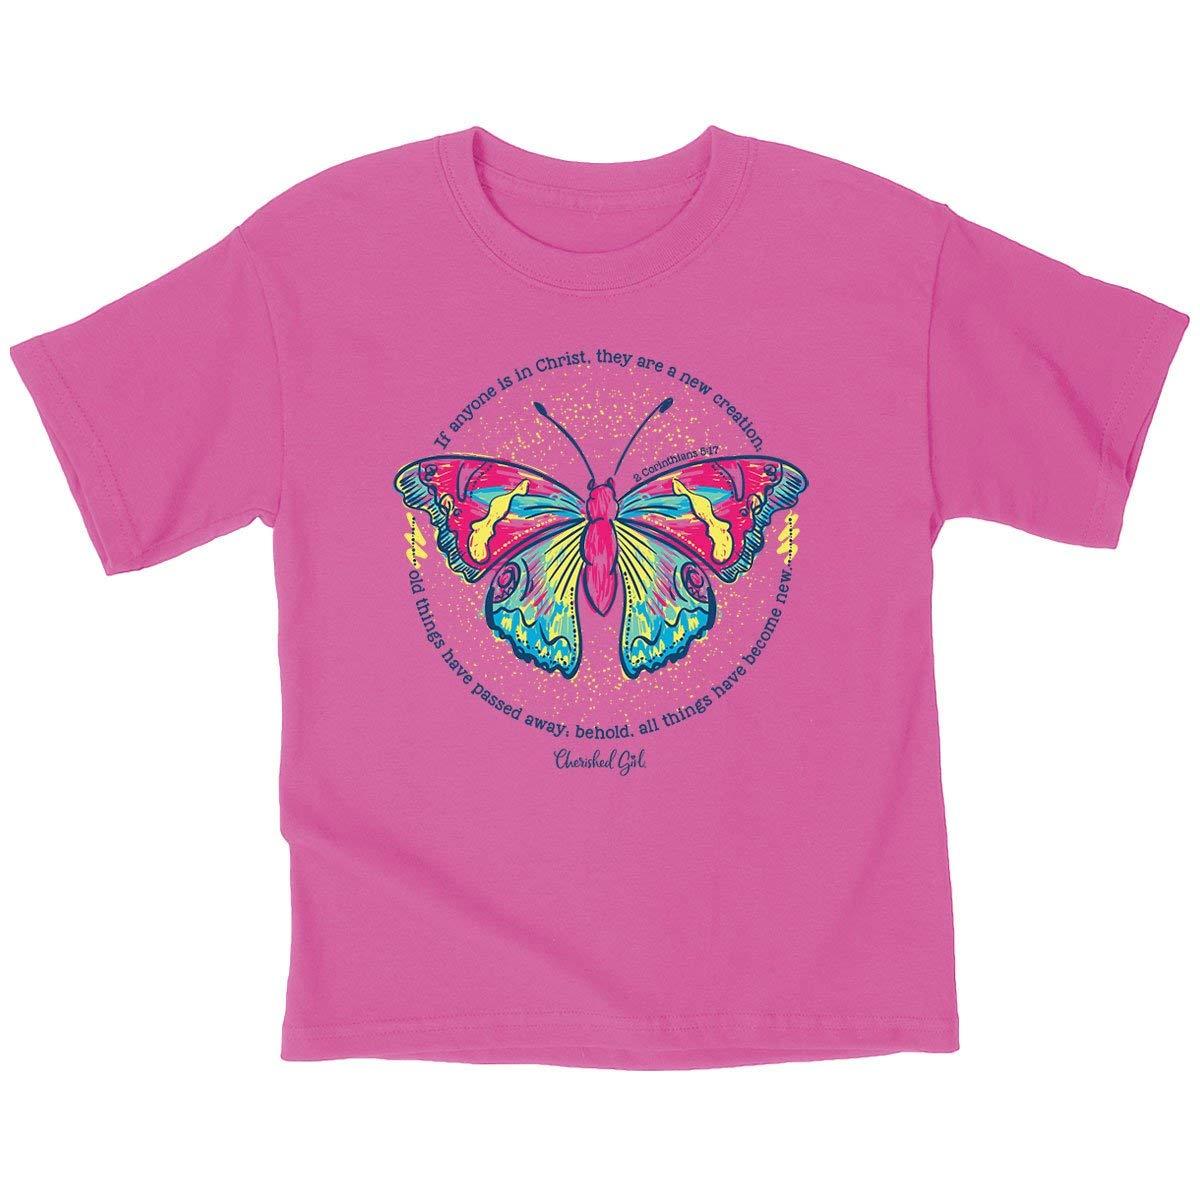 Cherished Girl Kids New Creation T-Shirt – Safety Pink –